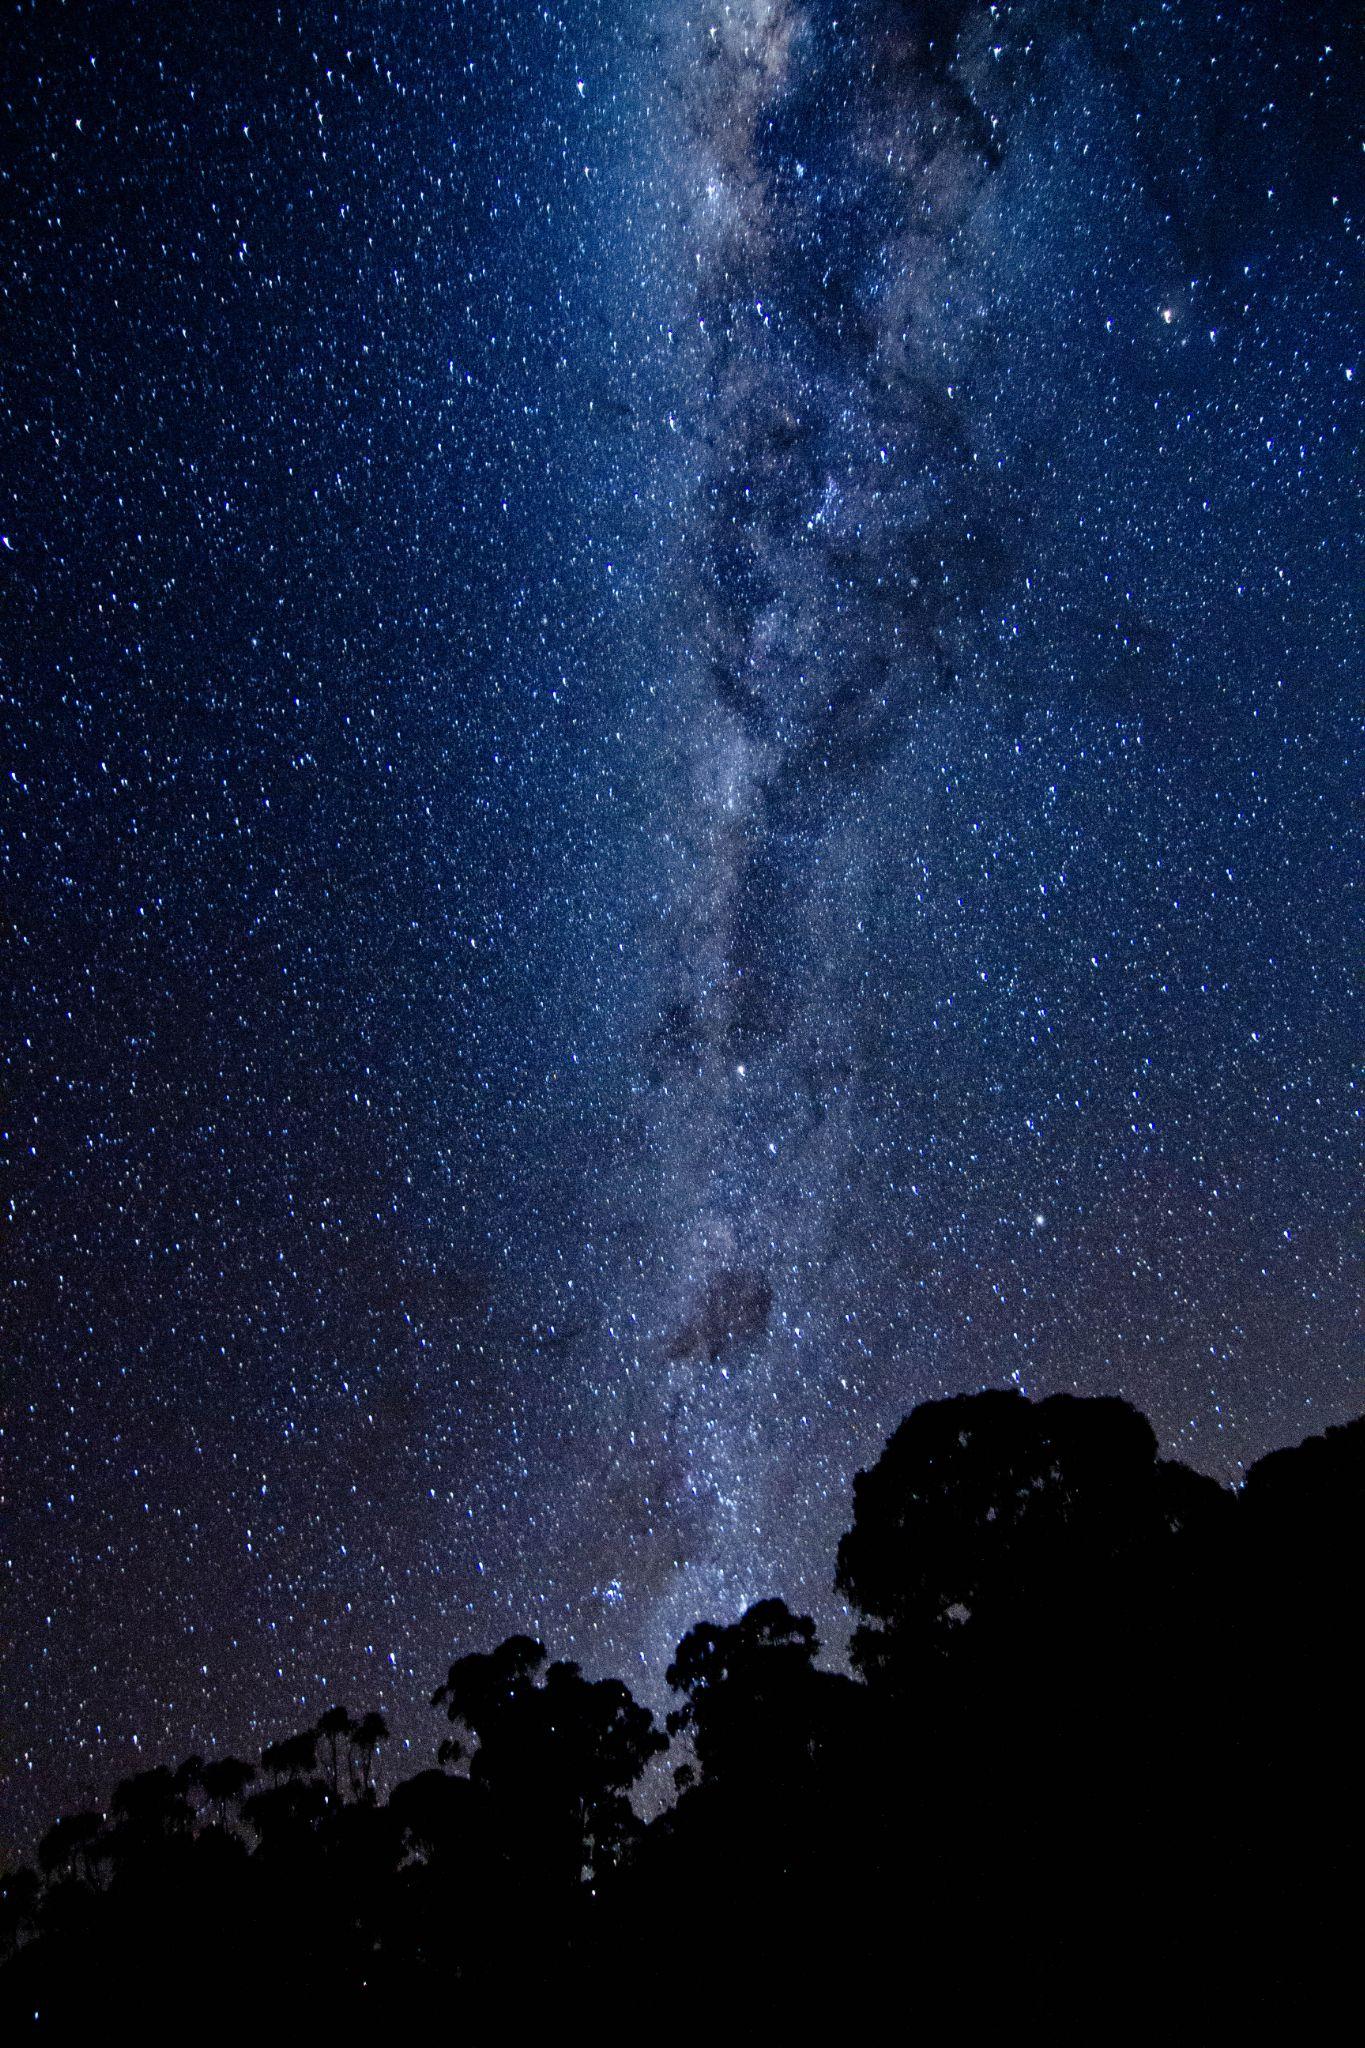 Under the Milkyway by Jayson Pratt